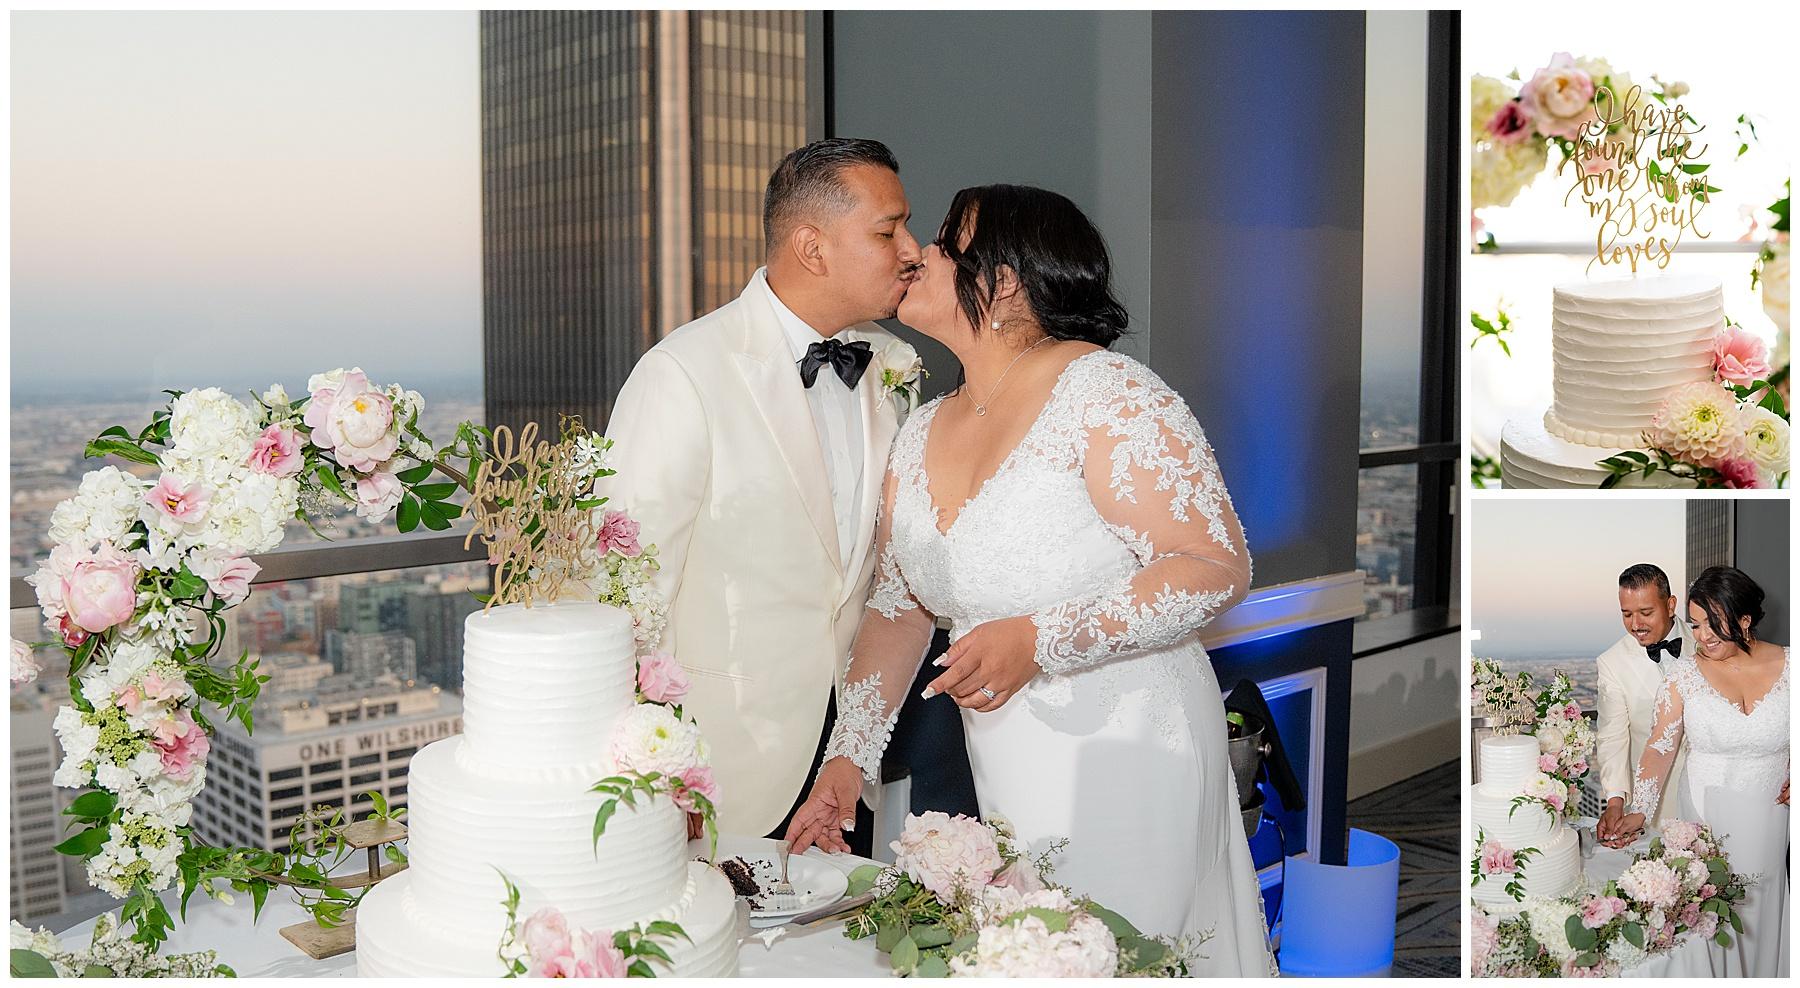 city club la wedding